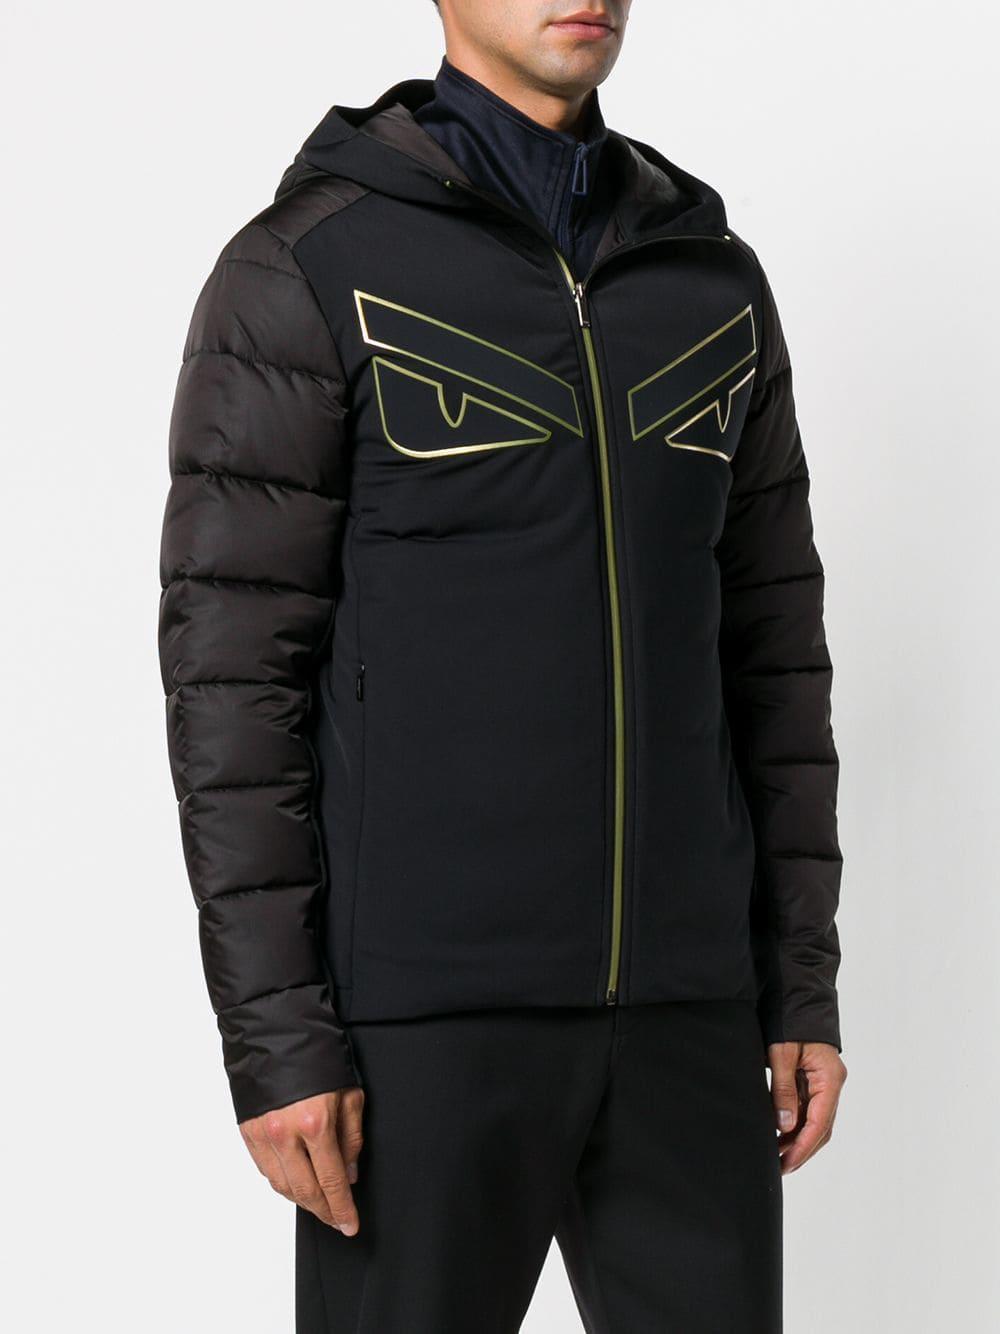 Fendi Synthetic Hooded Padded Jacket in Black for Men